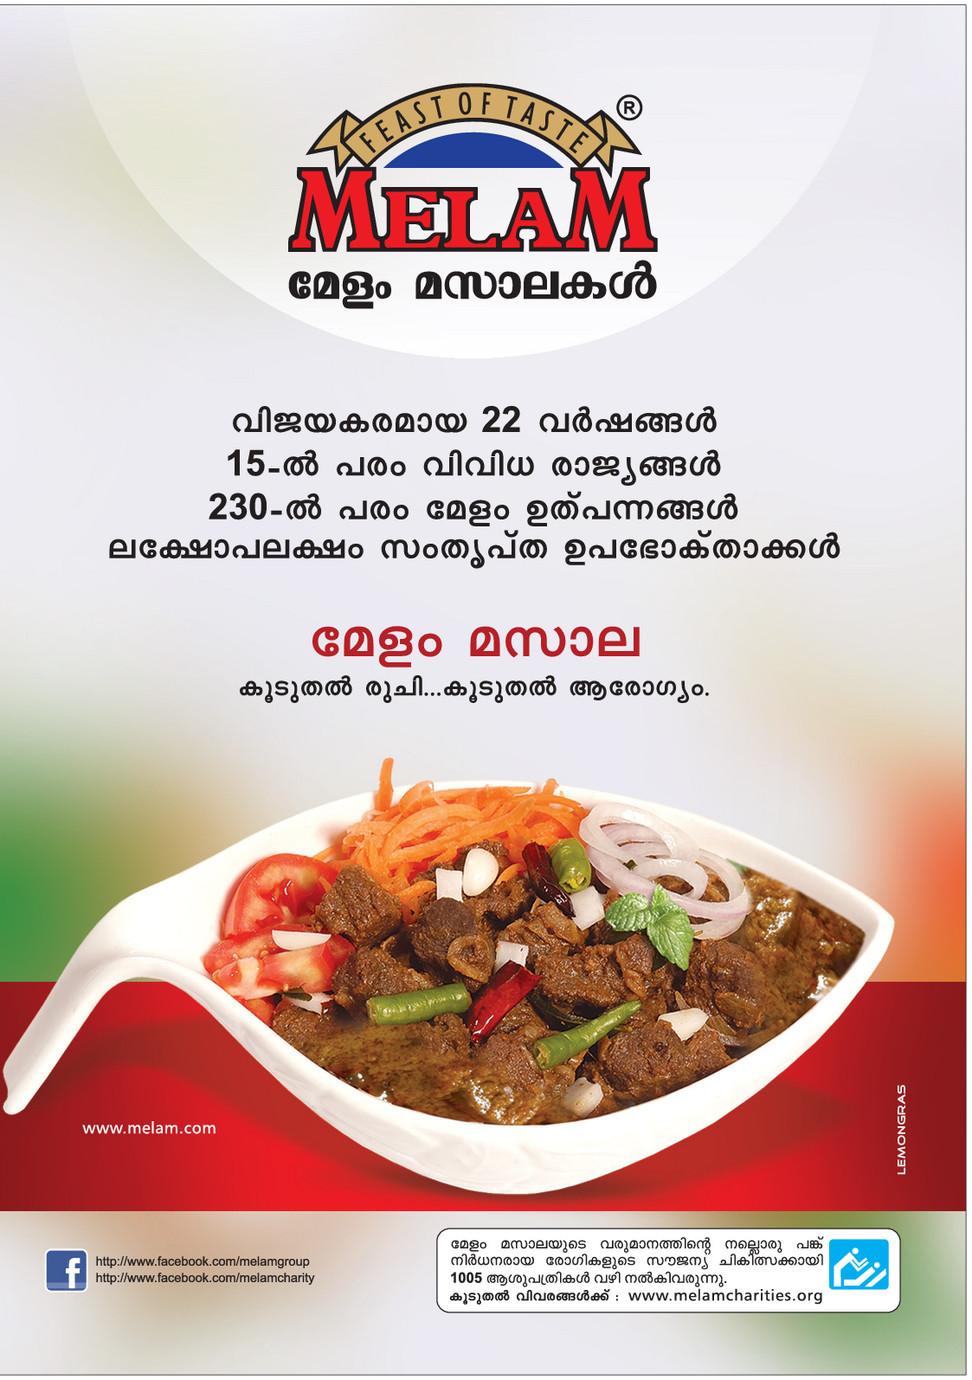 Spice (Masala) ads – Malayalam Advertising copy reference